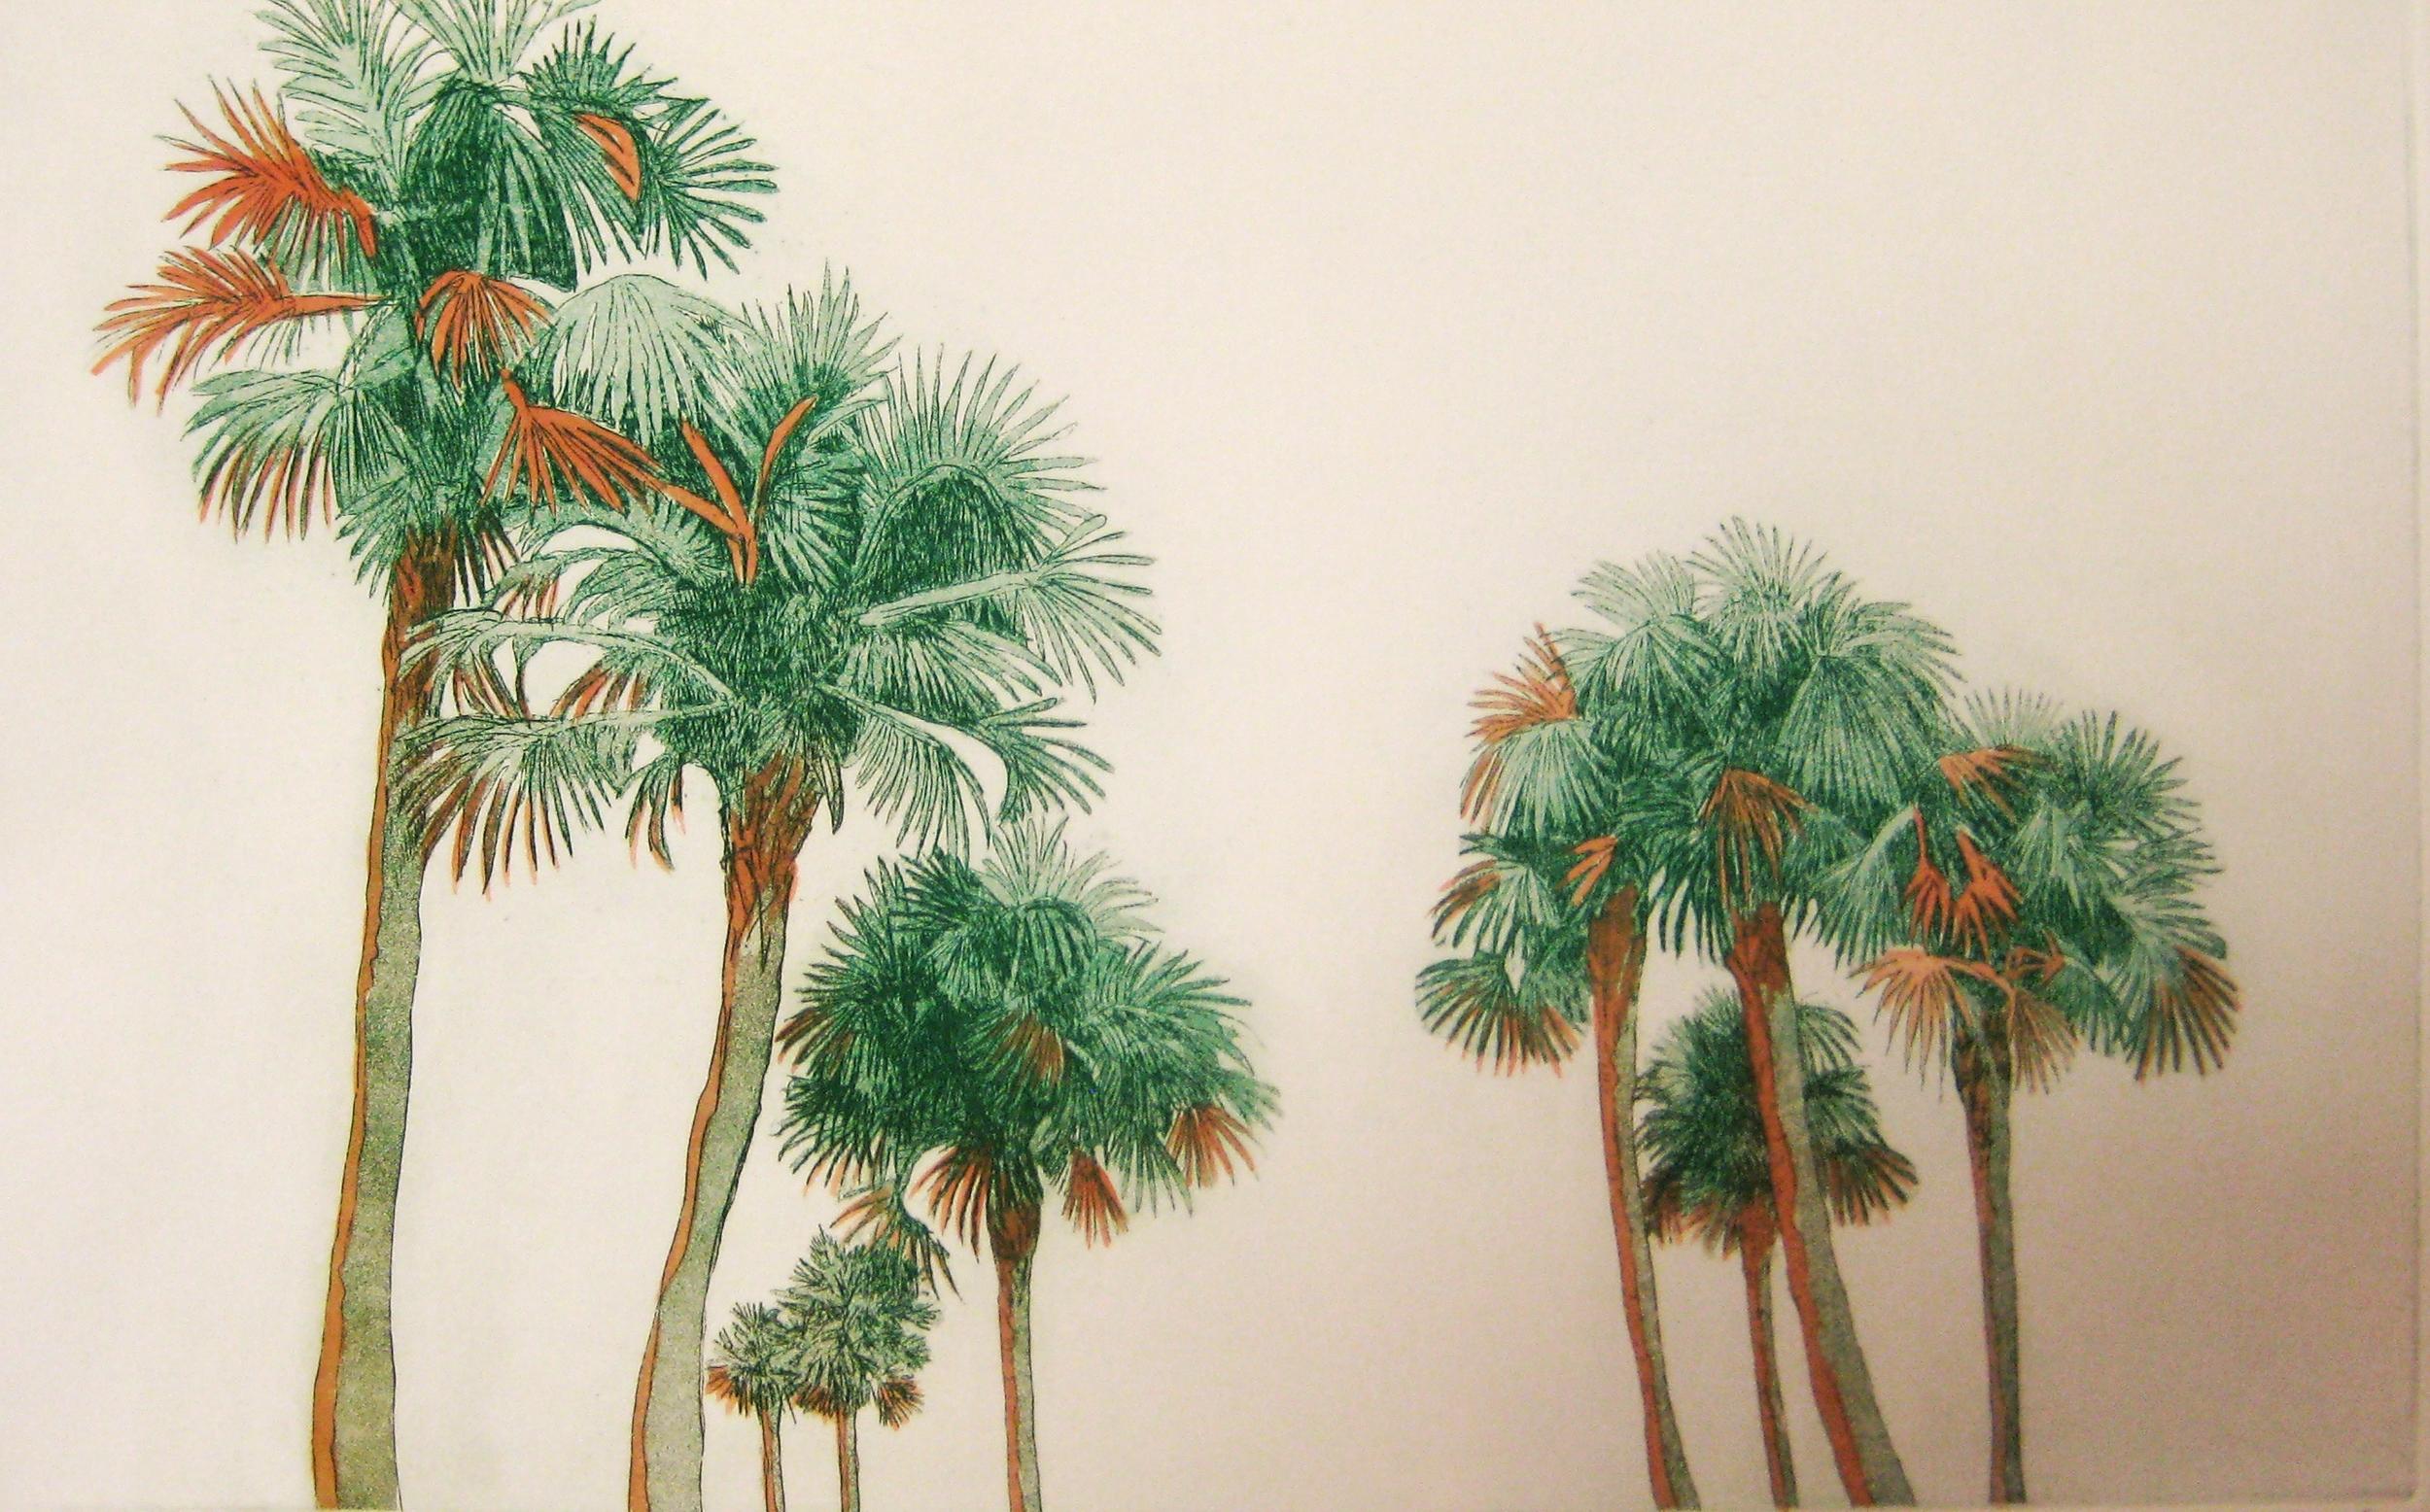 Sunkissed Palms